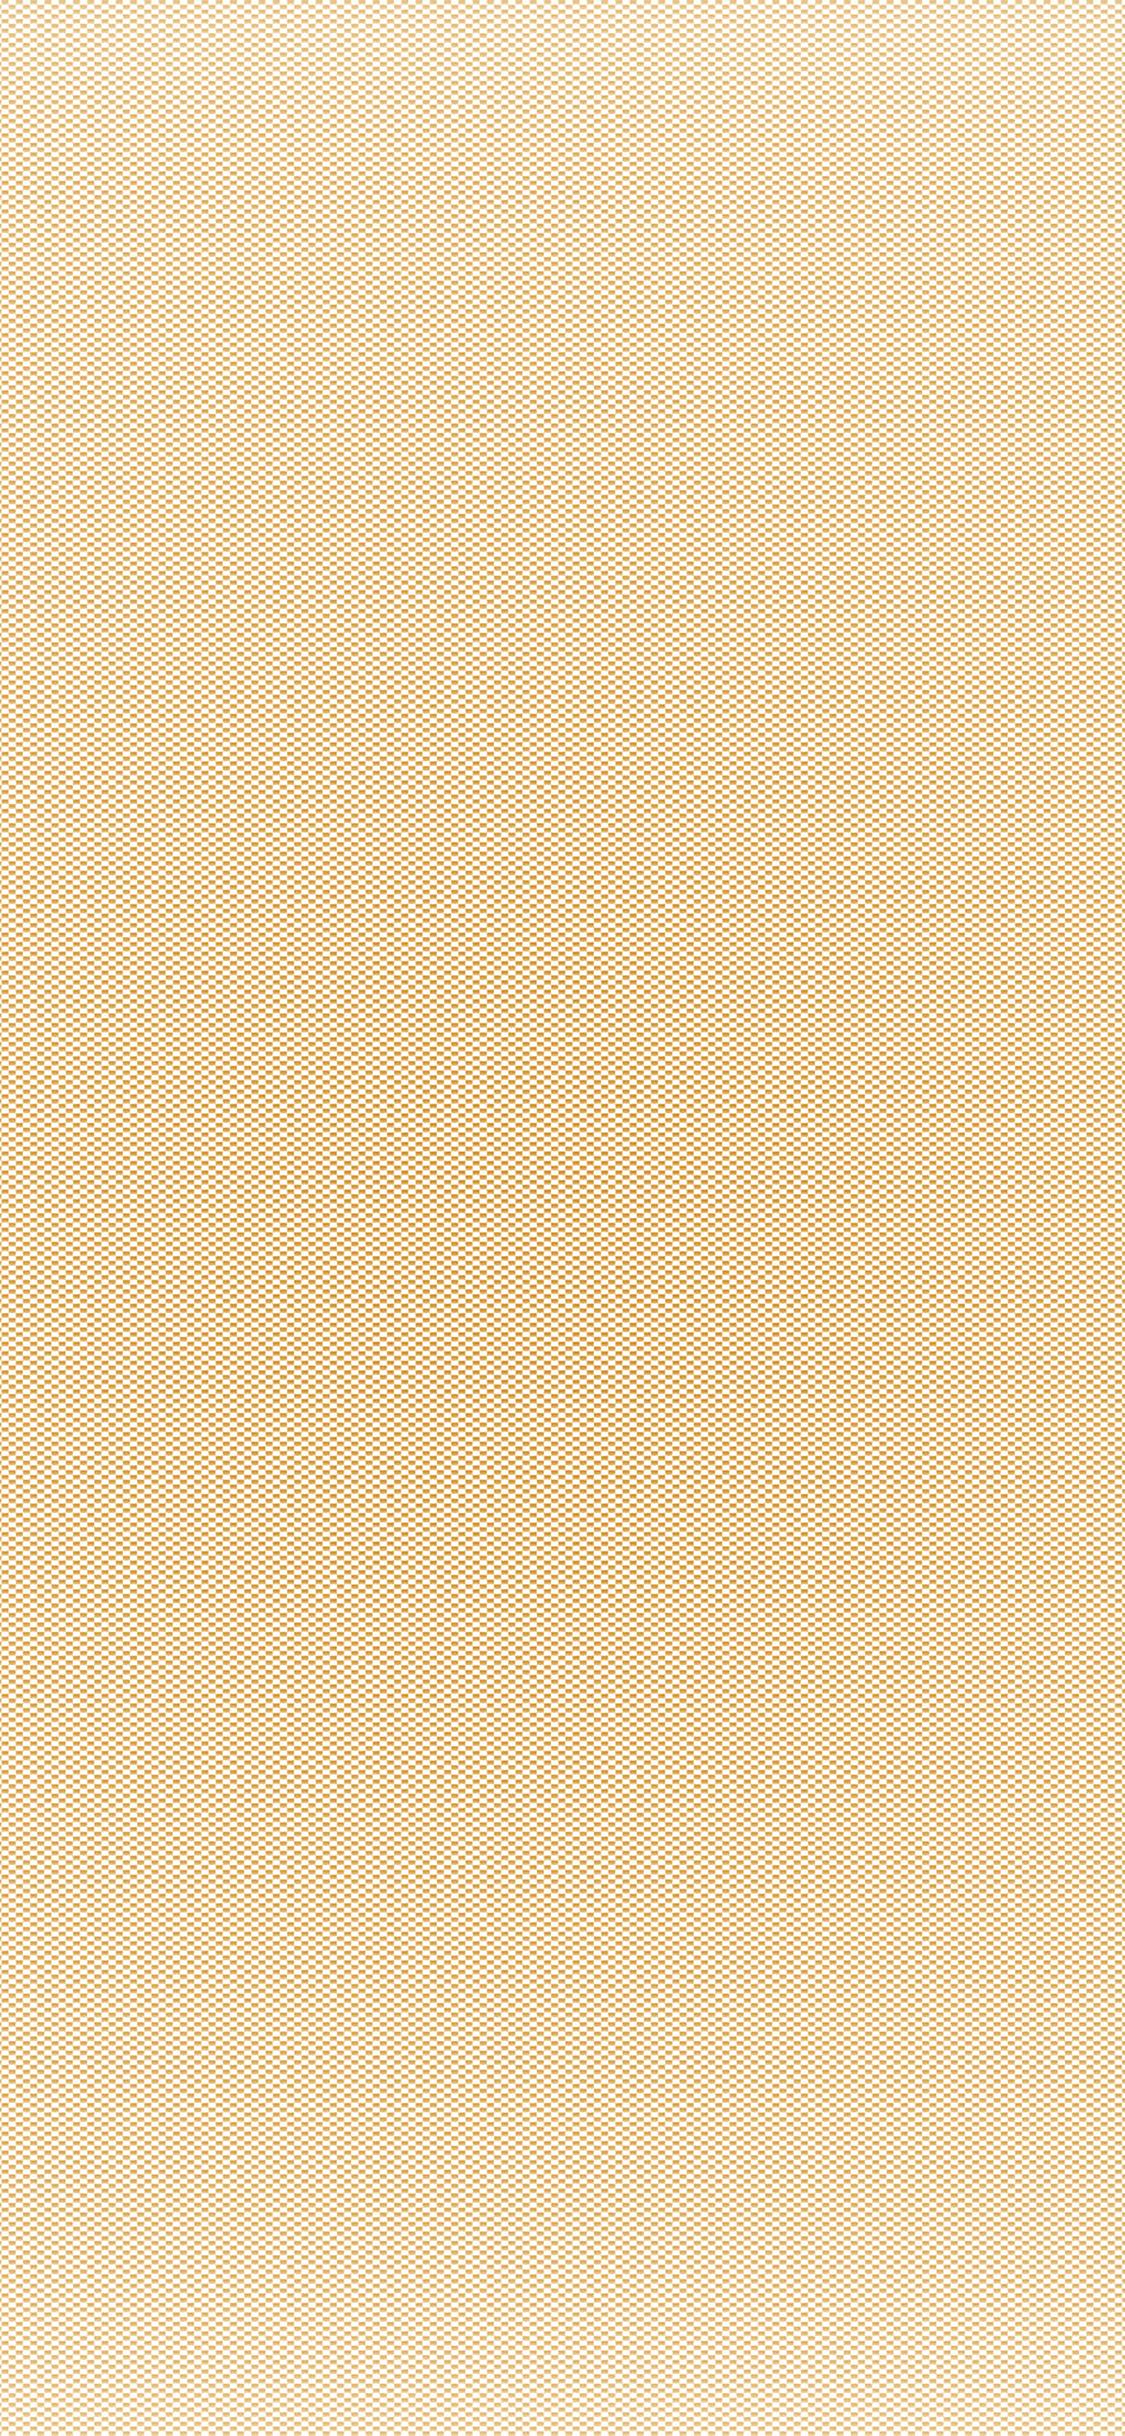 iPhoneXpapers.com-Apple-iPhone-wallpaper-vb76-wallpaper-gold-pattern-olive